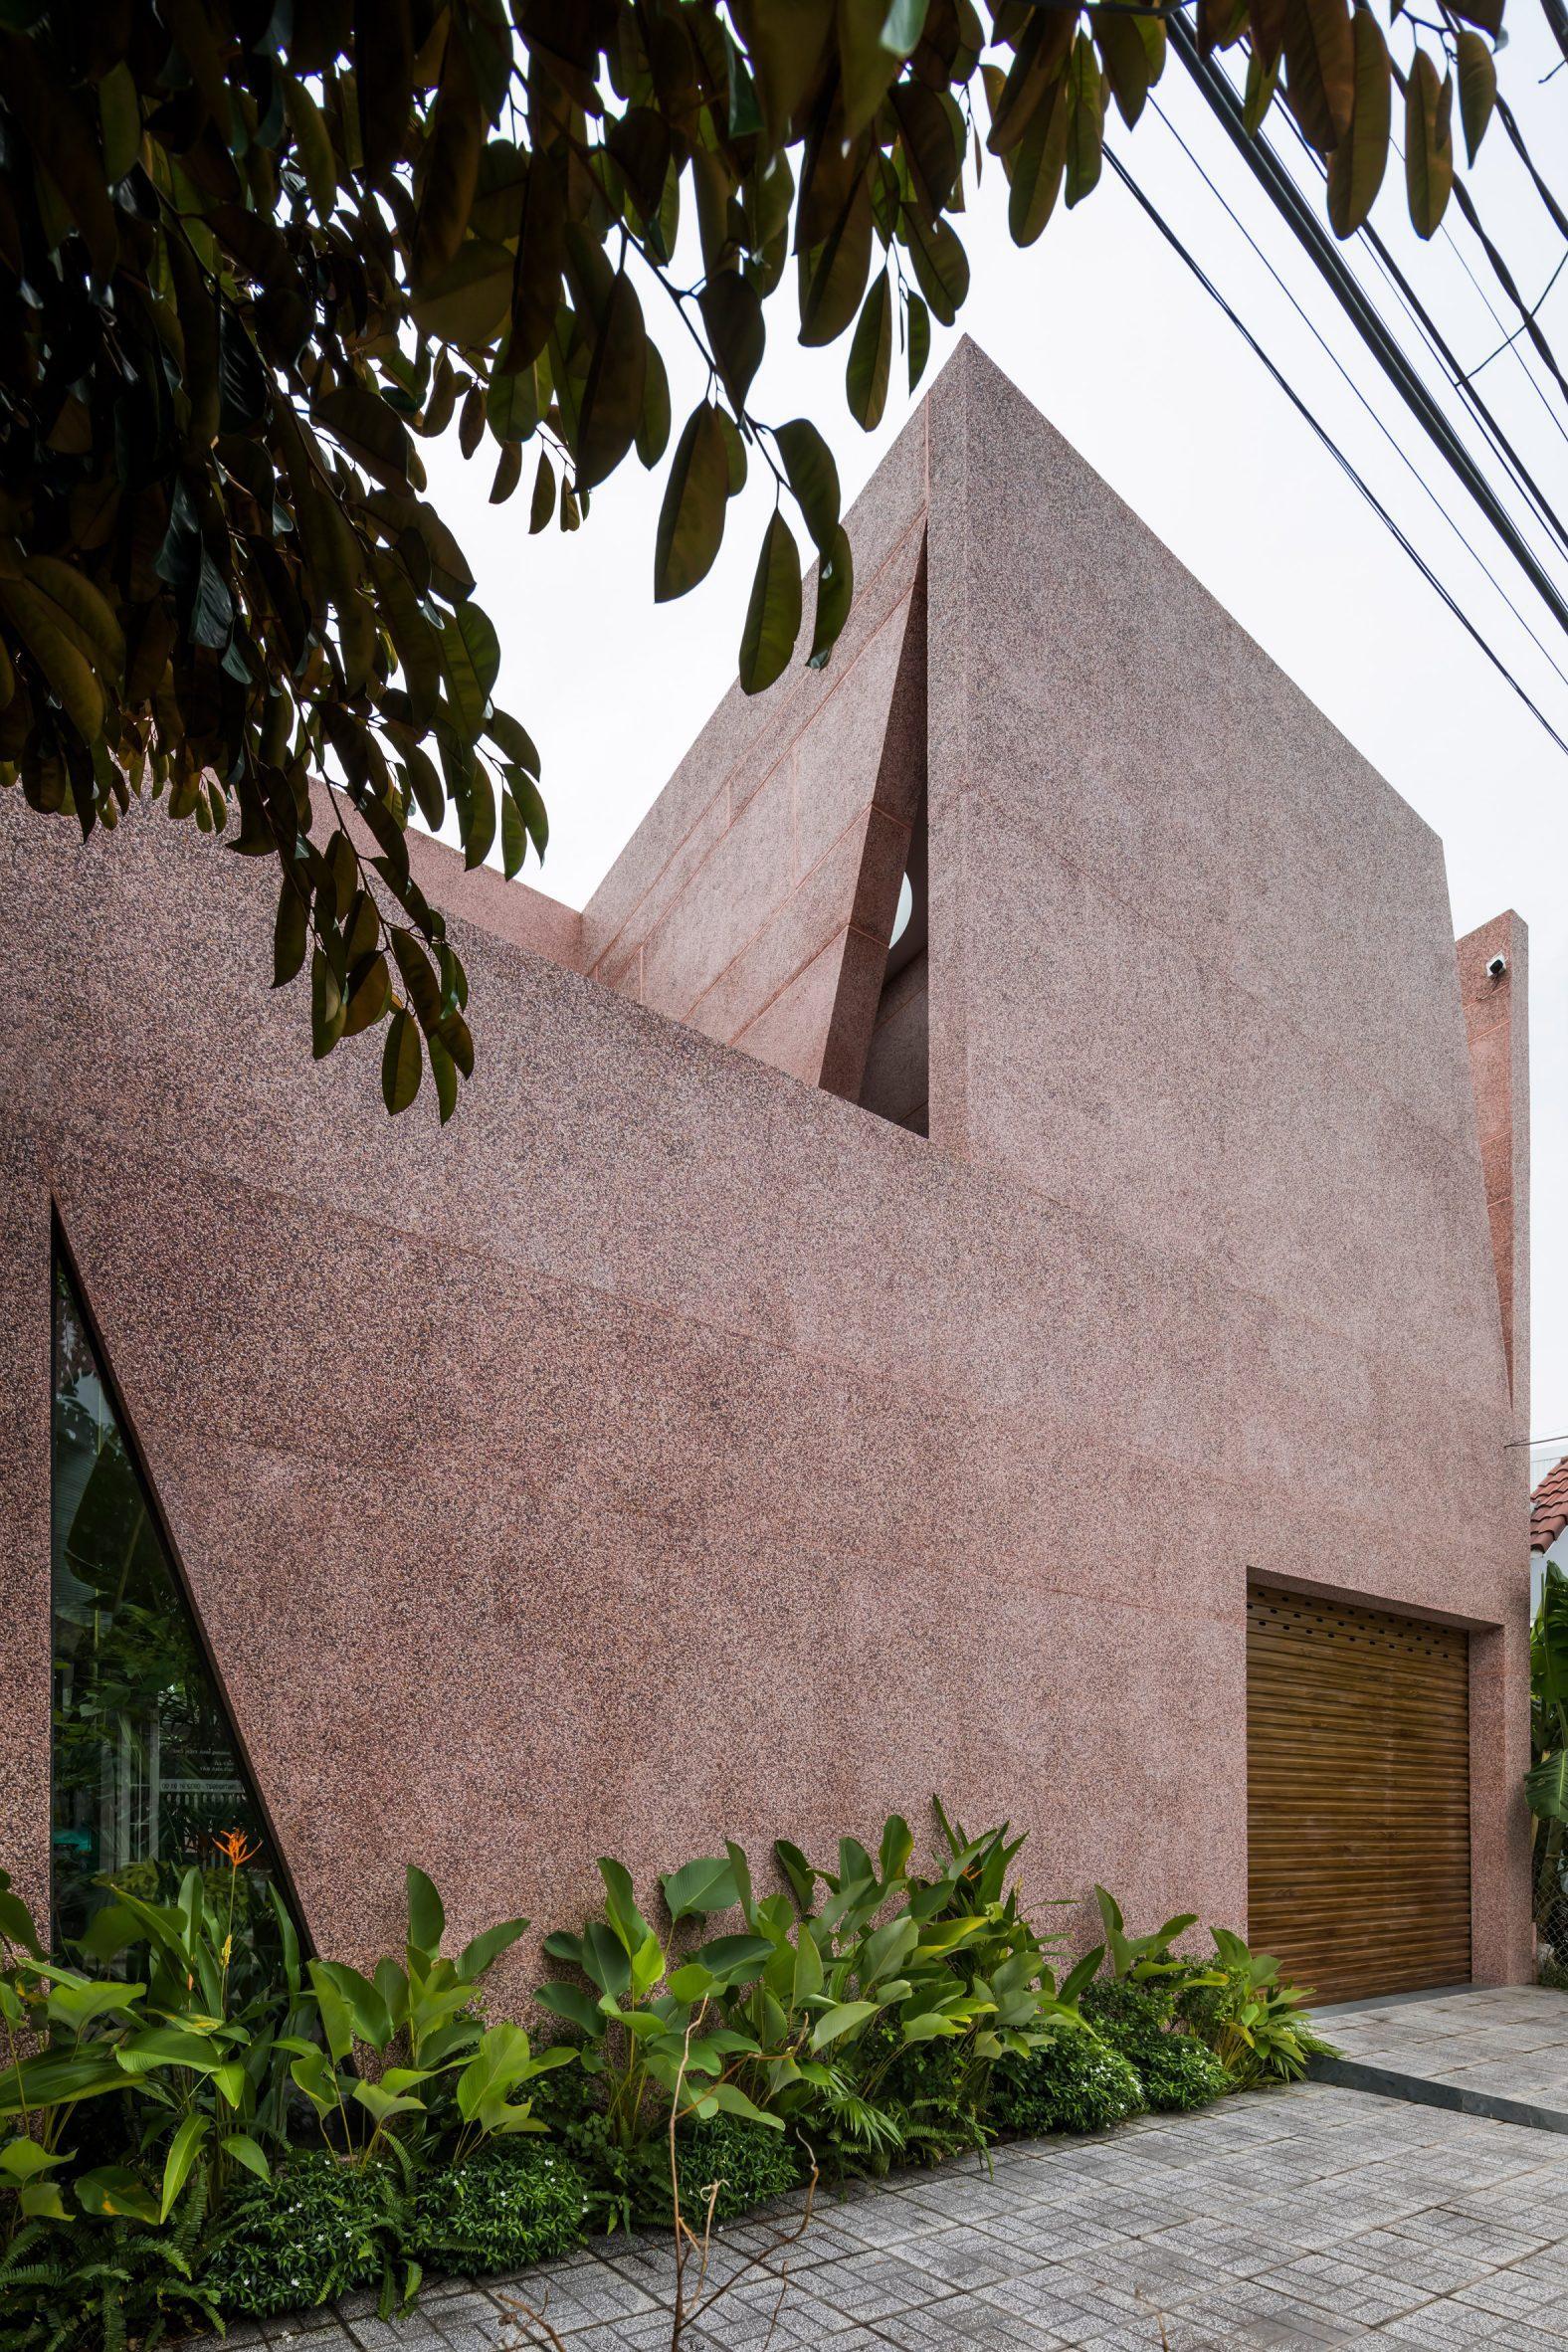 Pink house has a pebble dash exterior